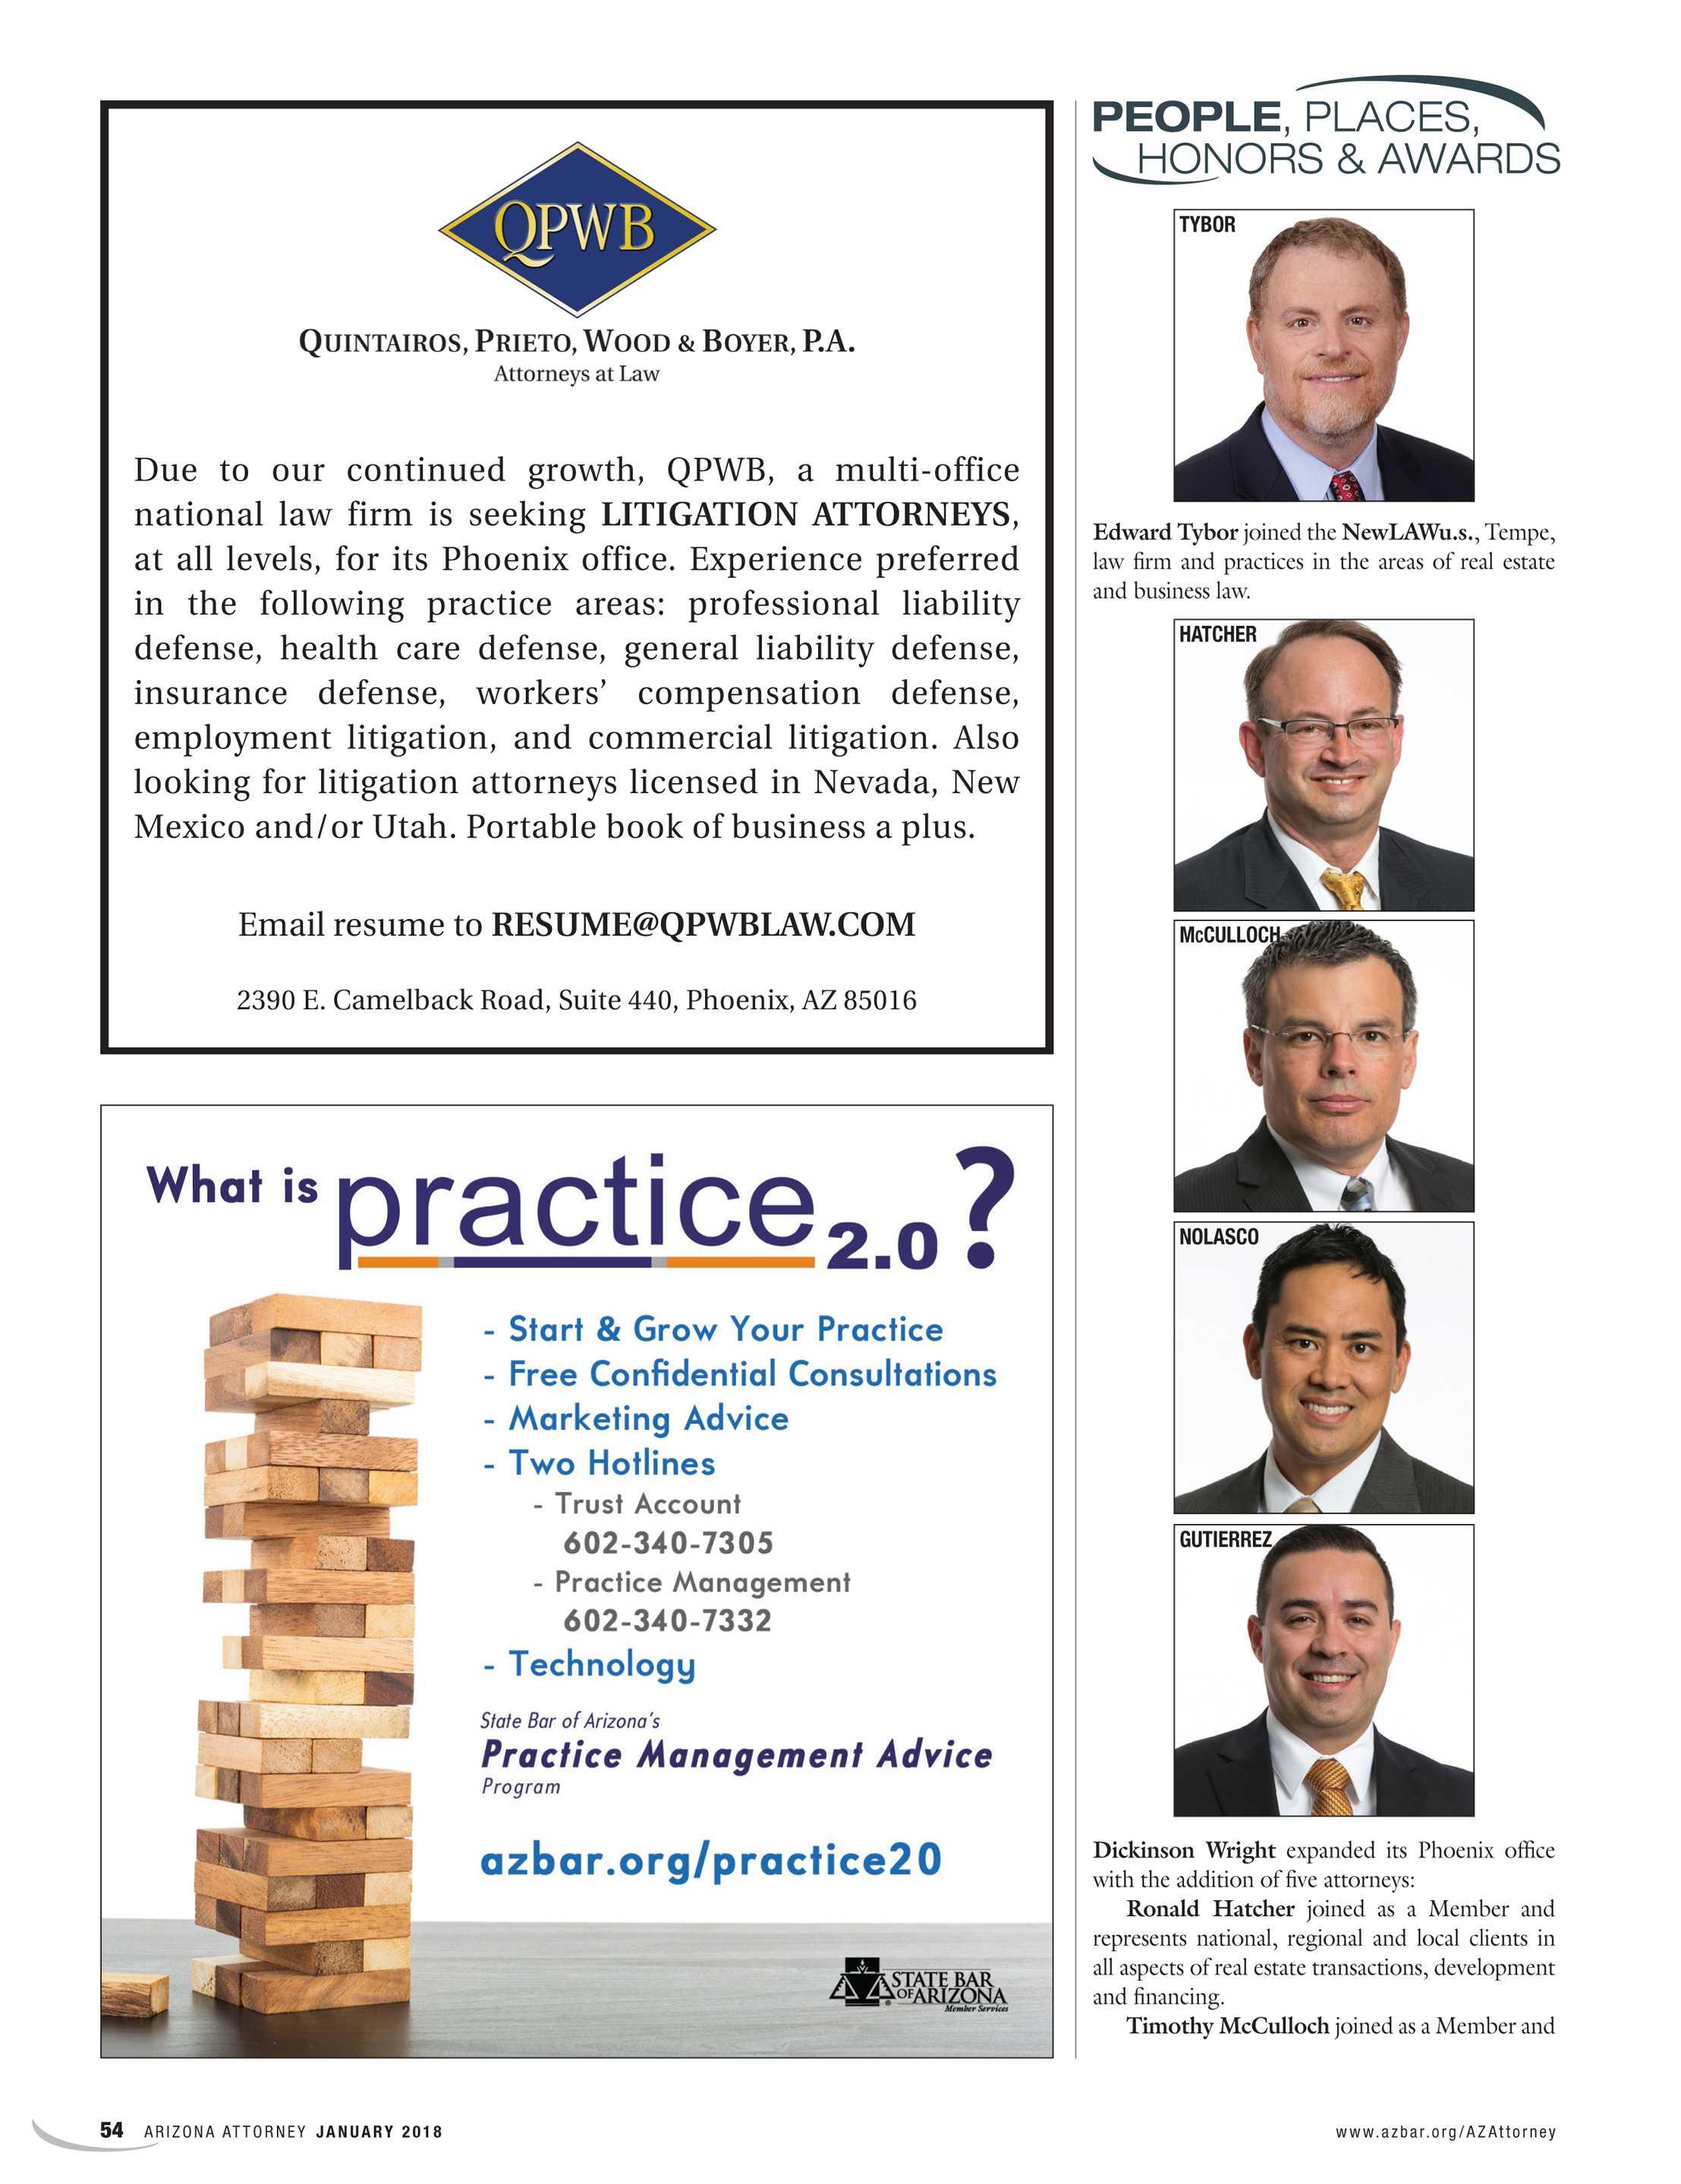 Arizona Attorney January 2018 Page 54